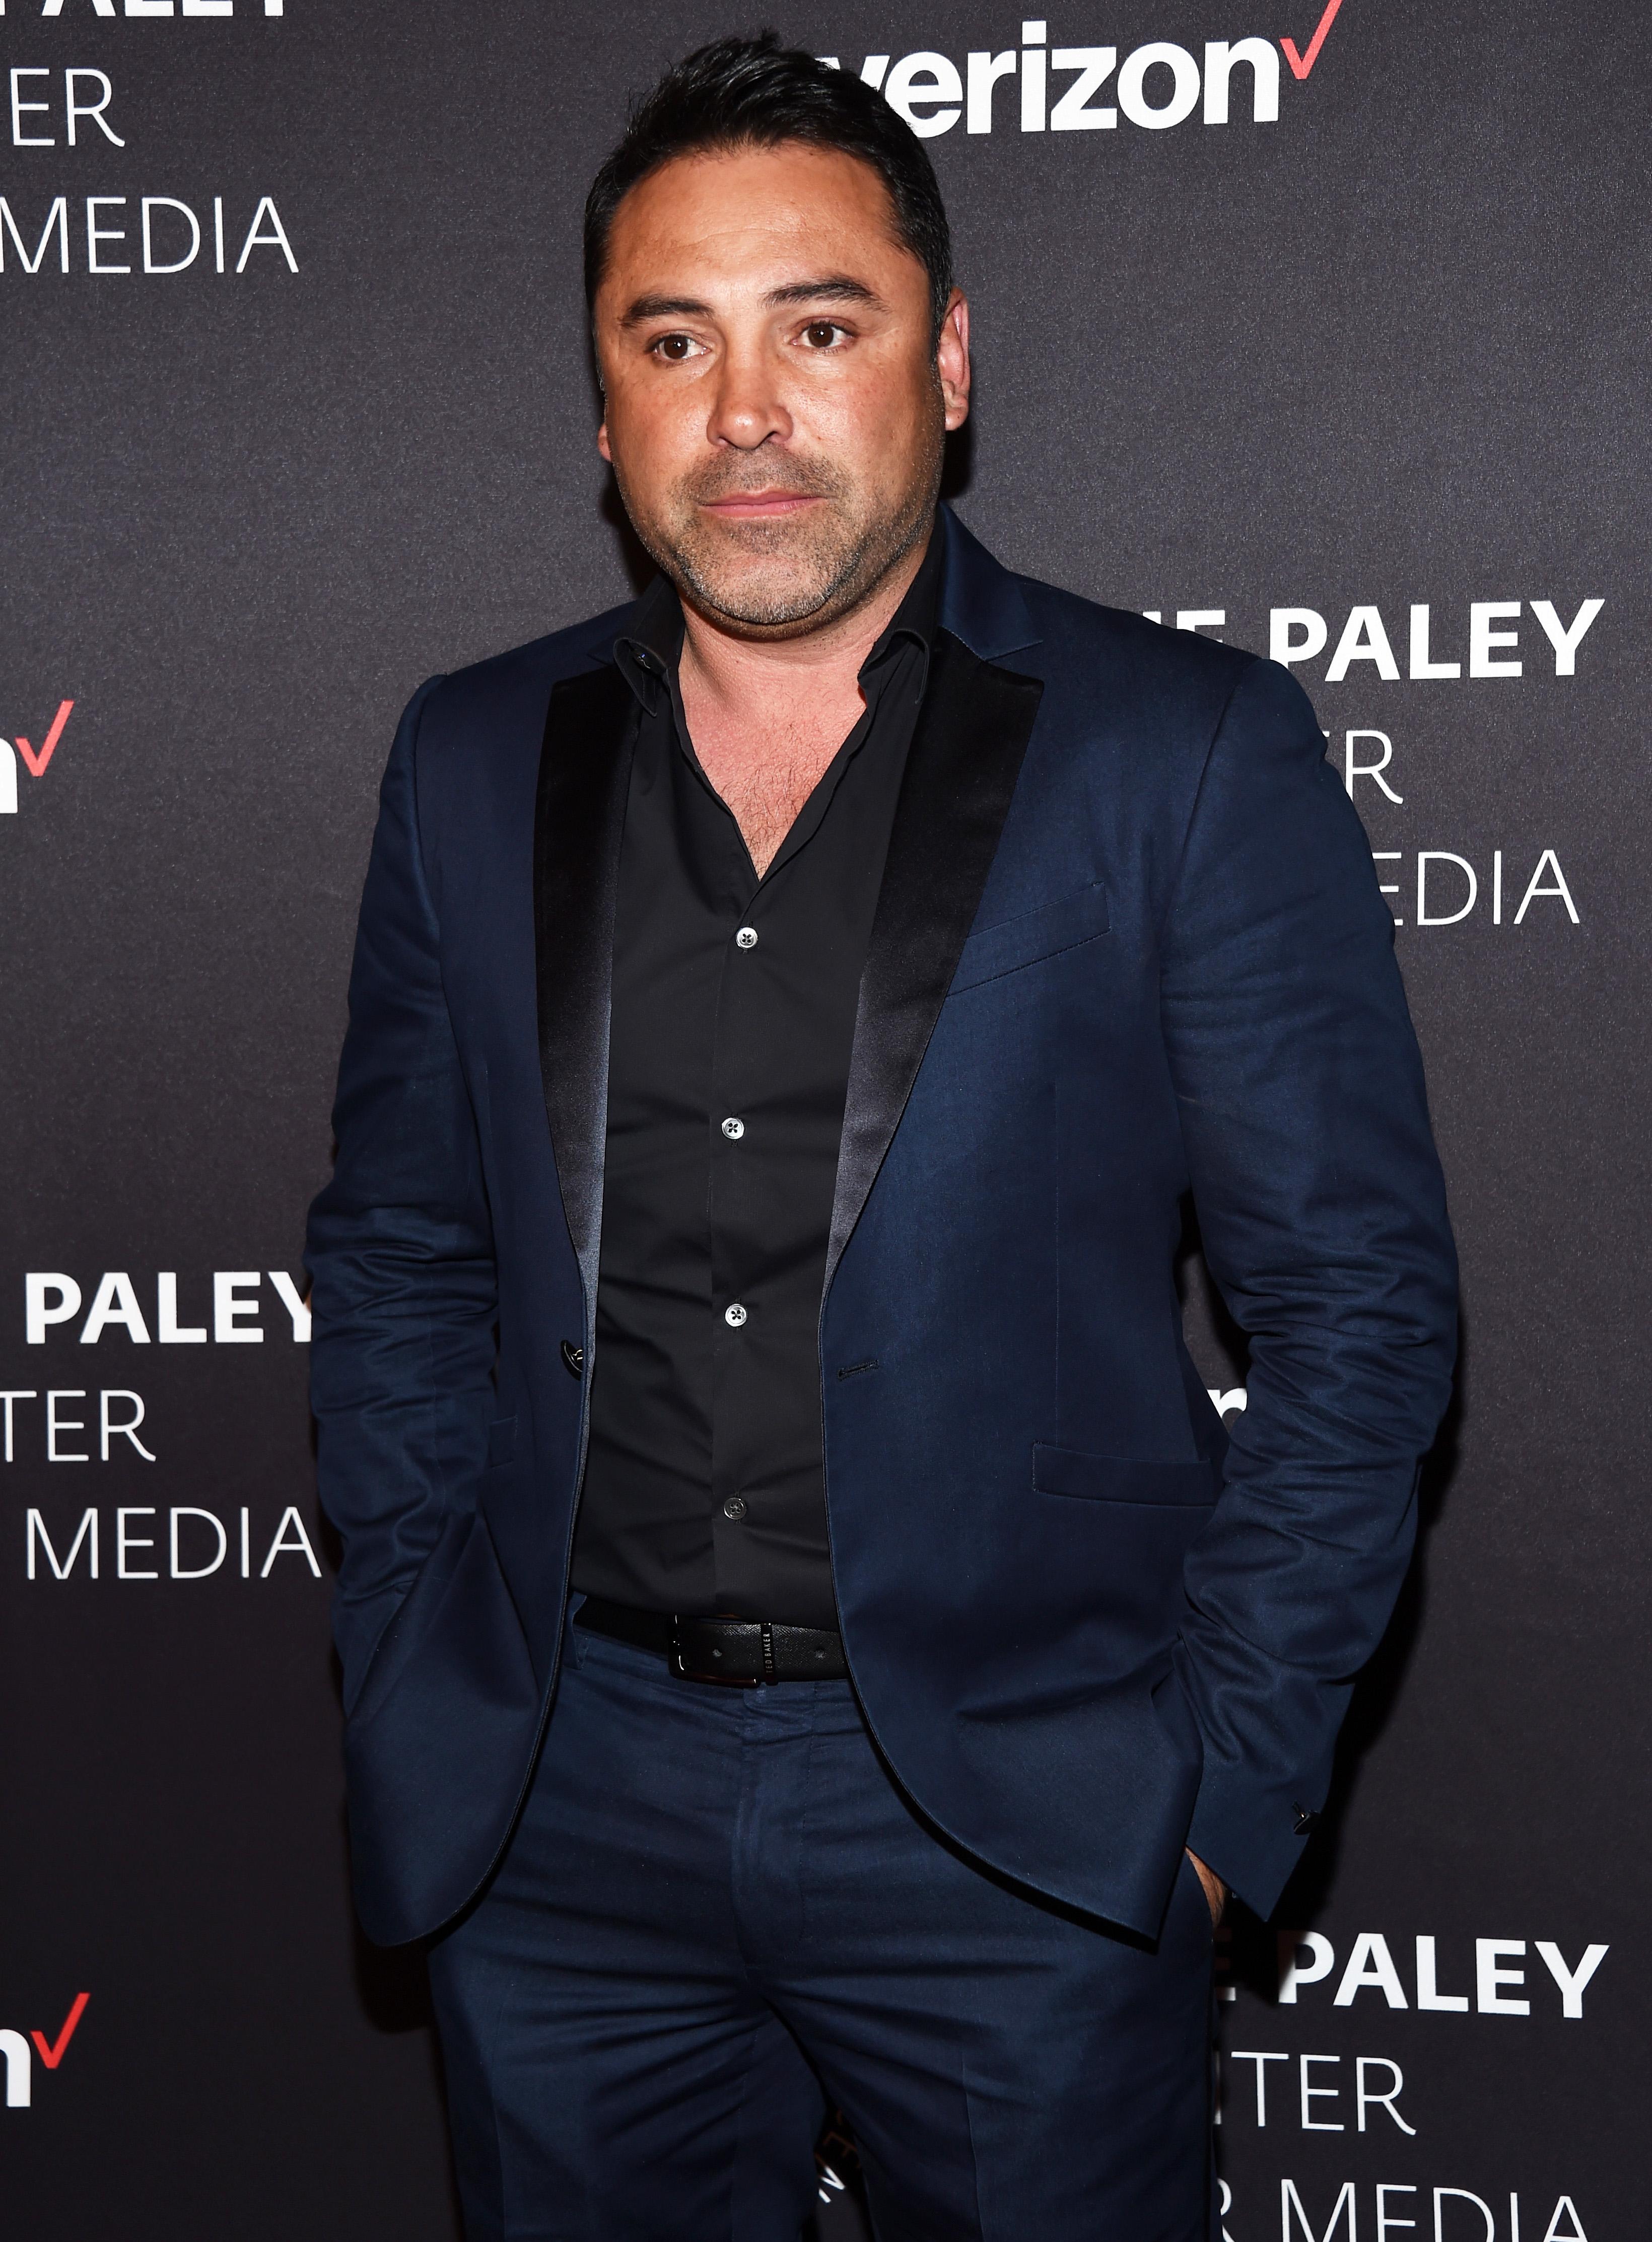 Oscar De La Hoya